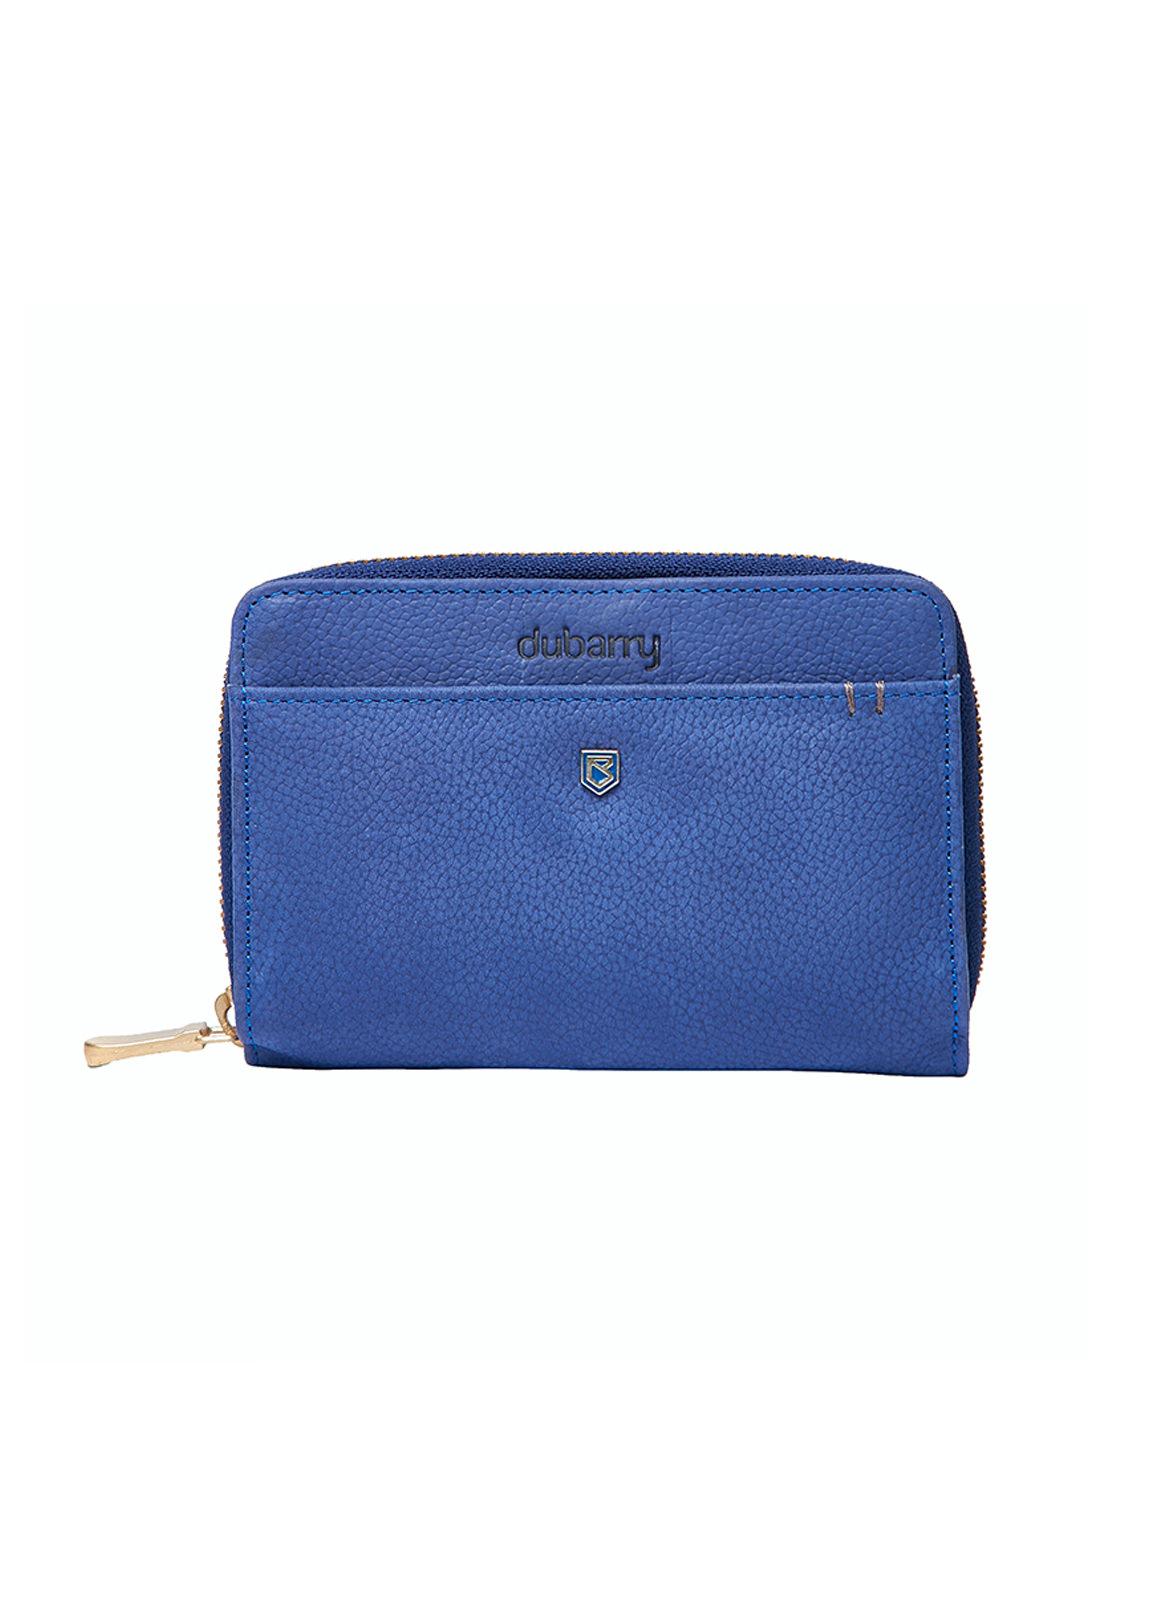 Portrush Leather  Wallet - Cobalt